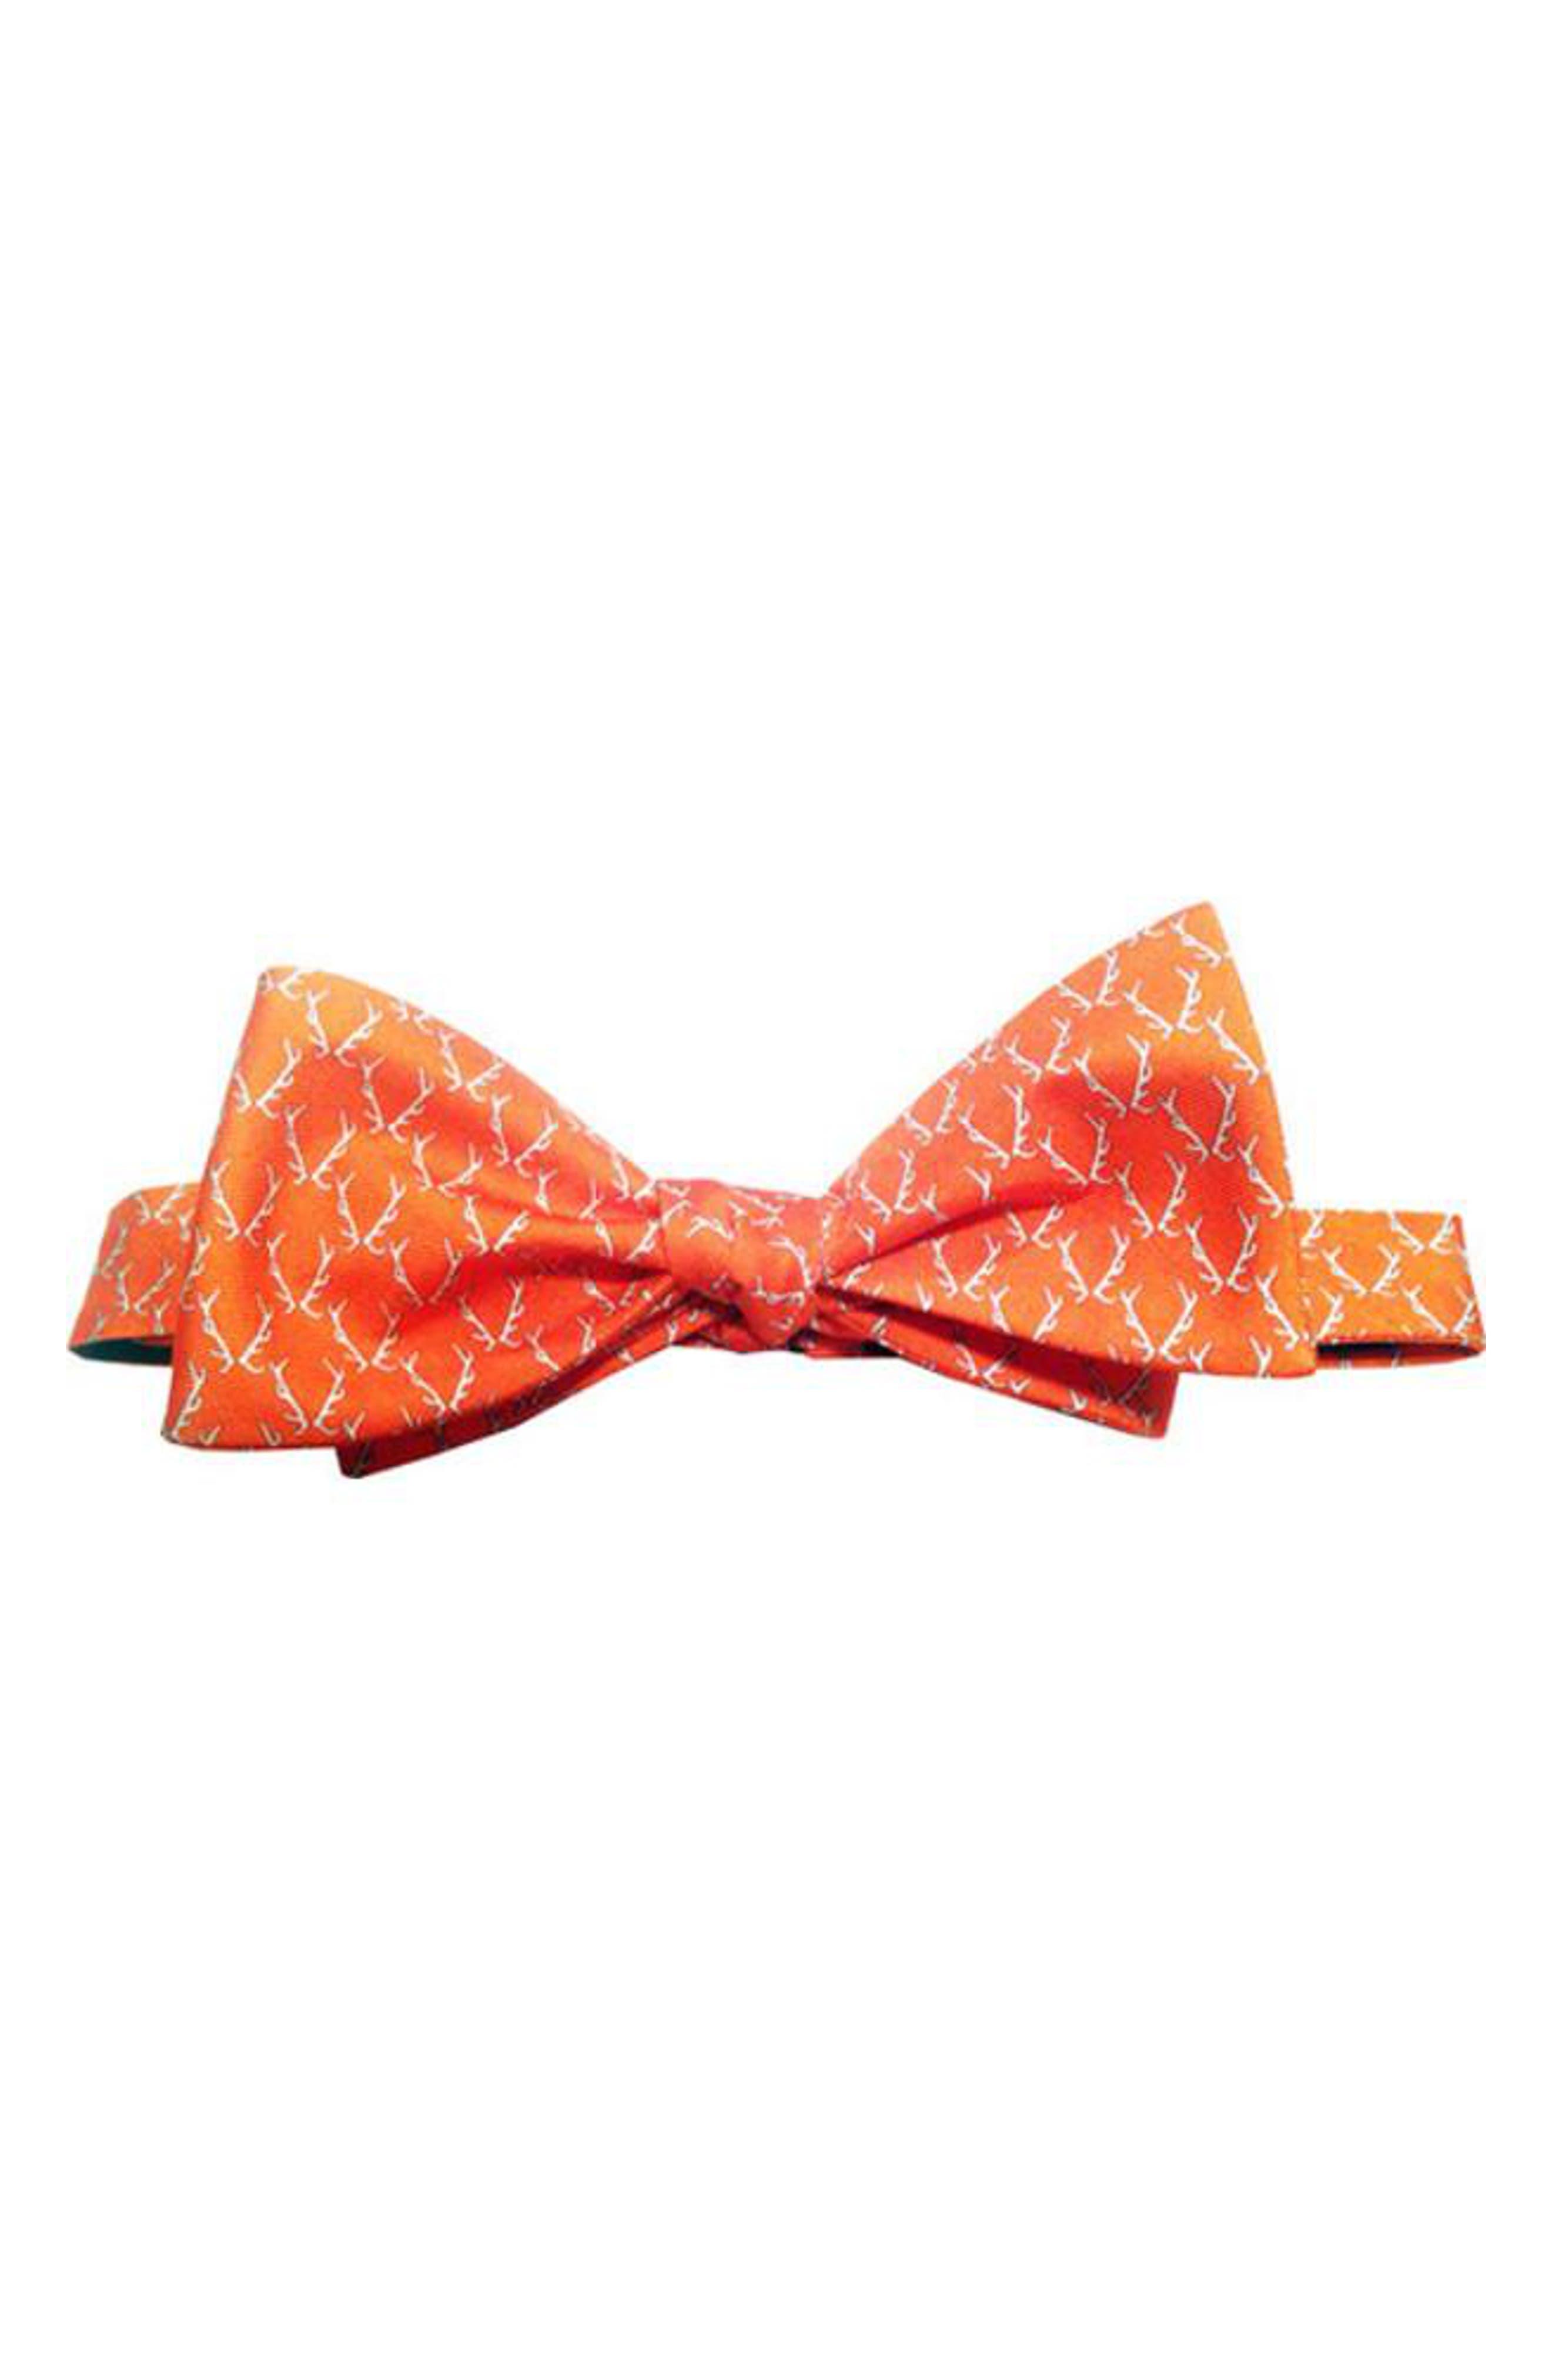 Buckwild Silk Bow Tie,                             Main thumbnail 1, color,                             Orange